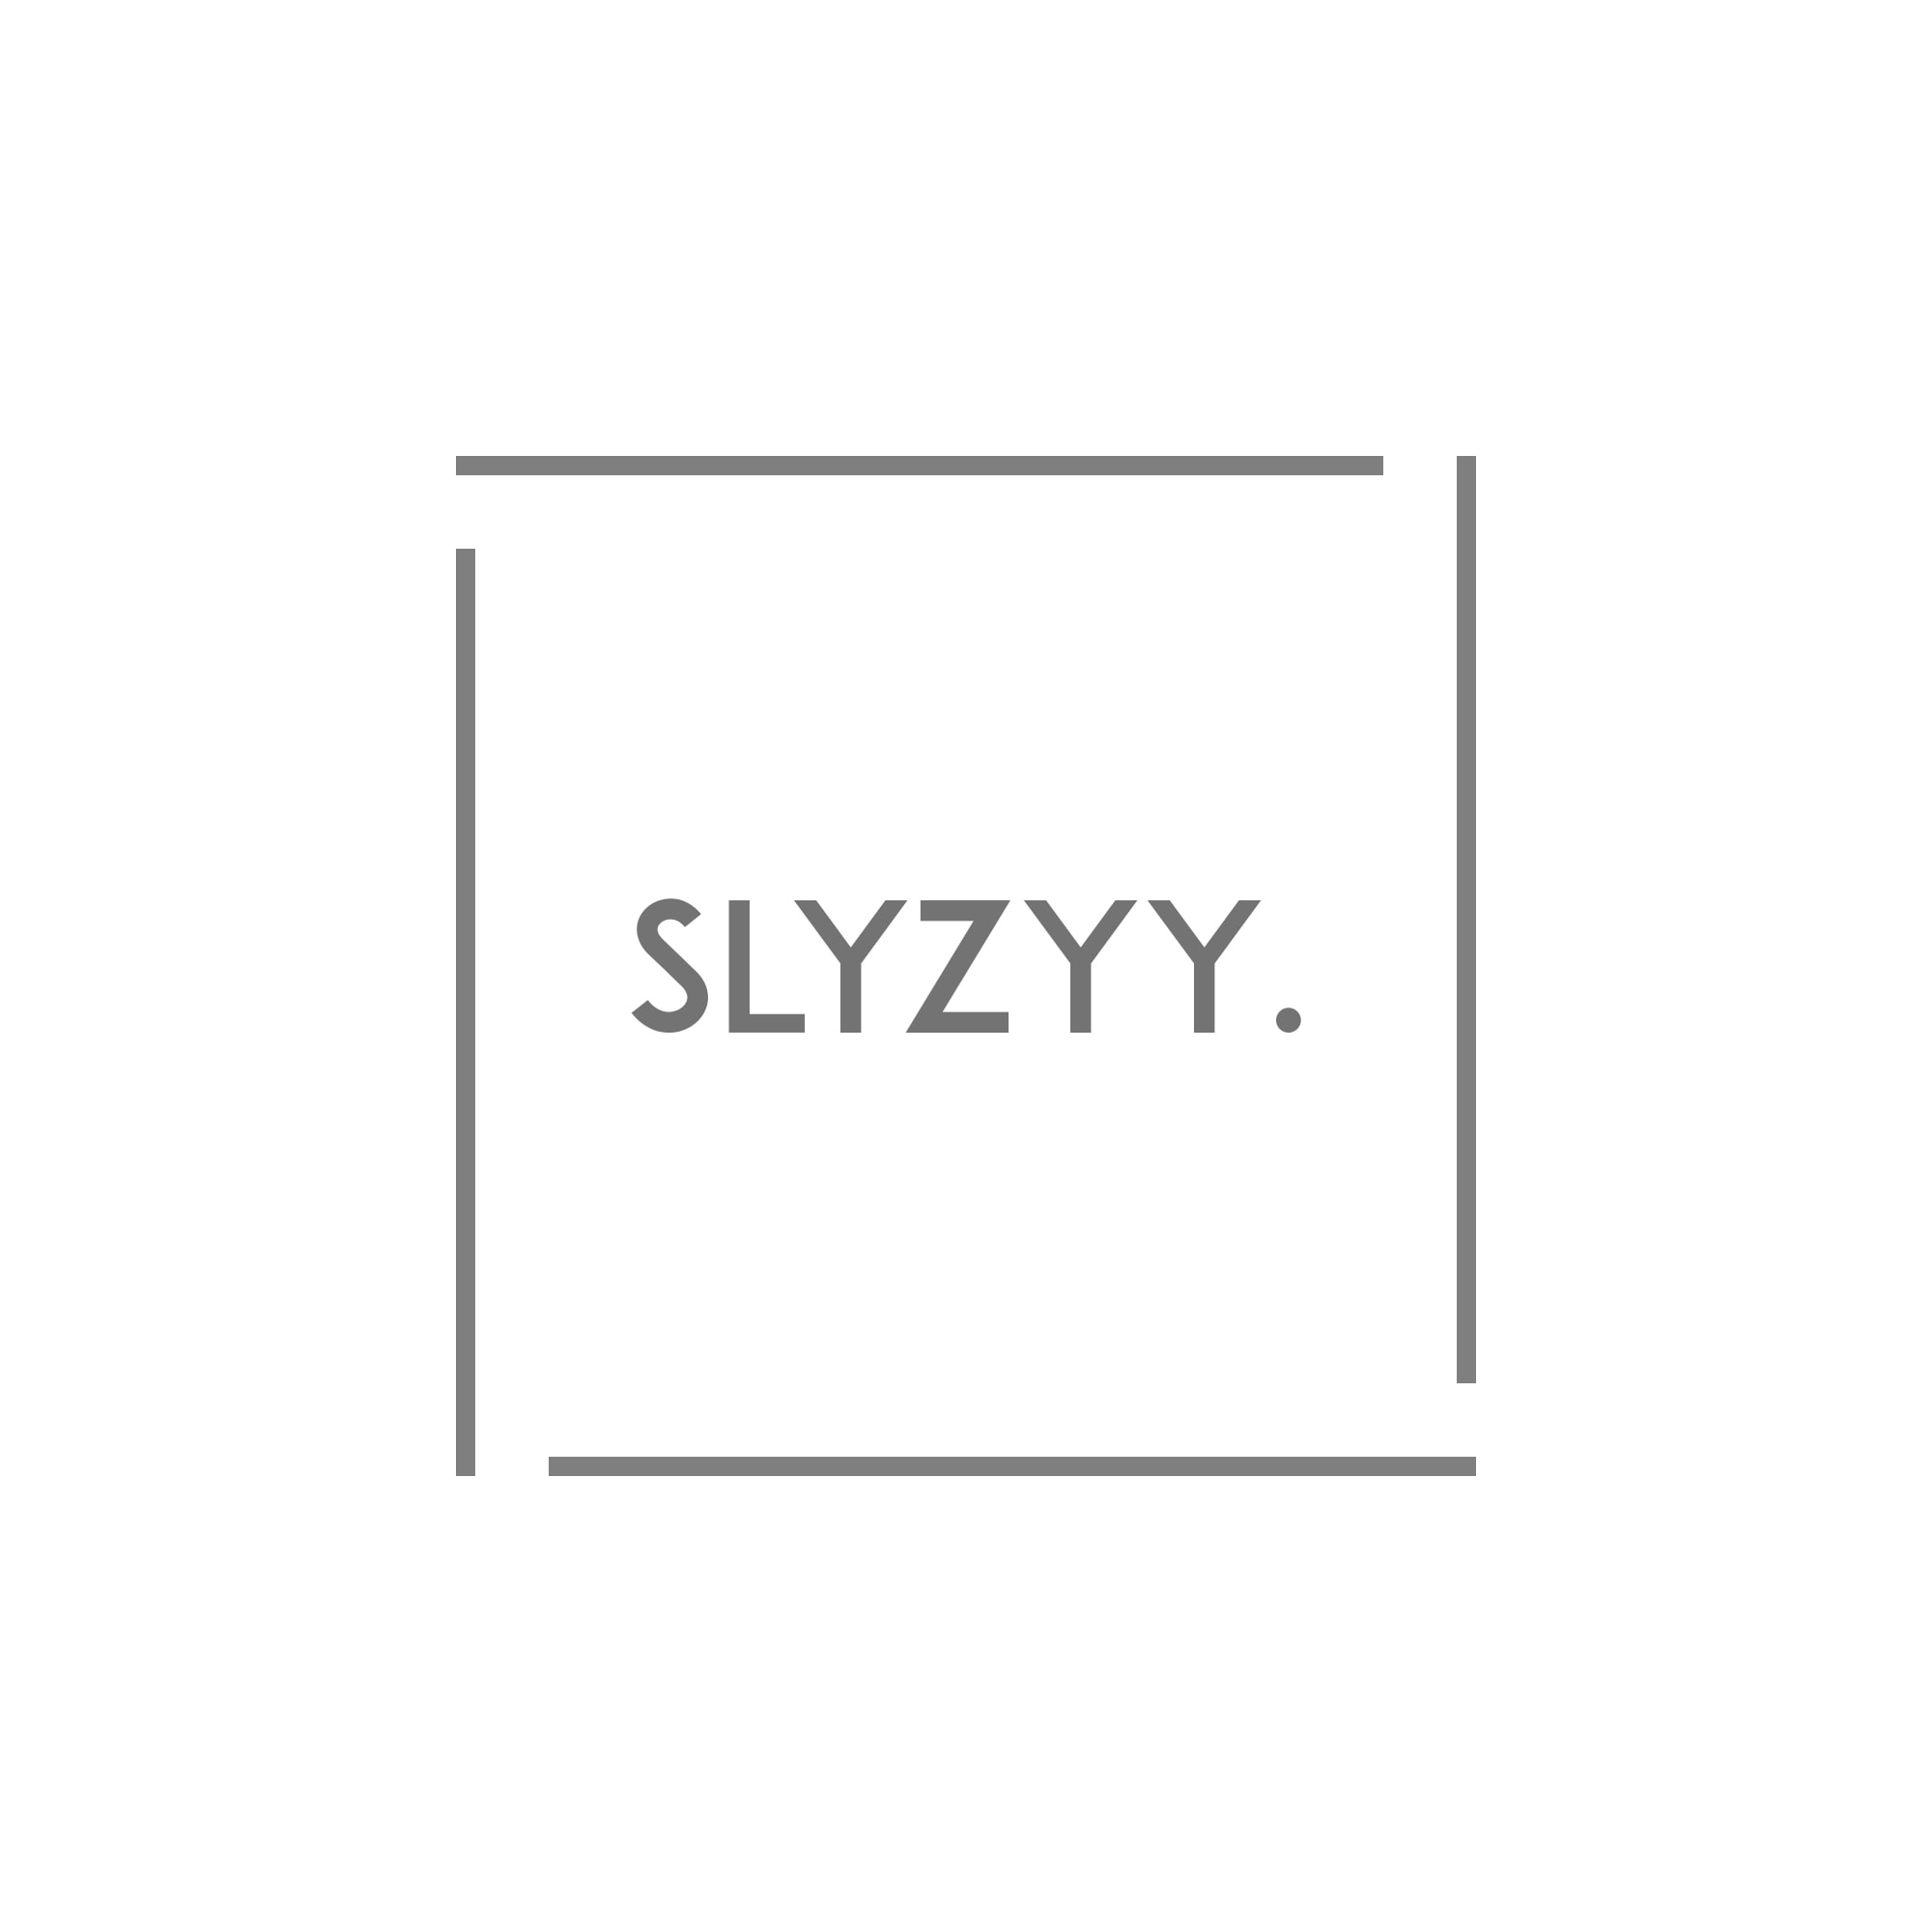 Go to Auzan Zaky's profile